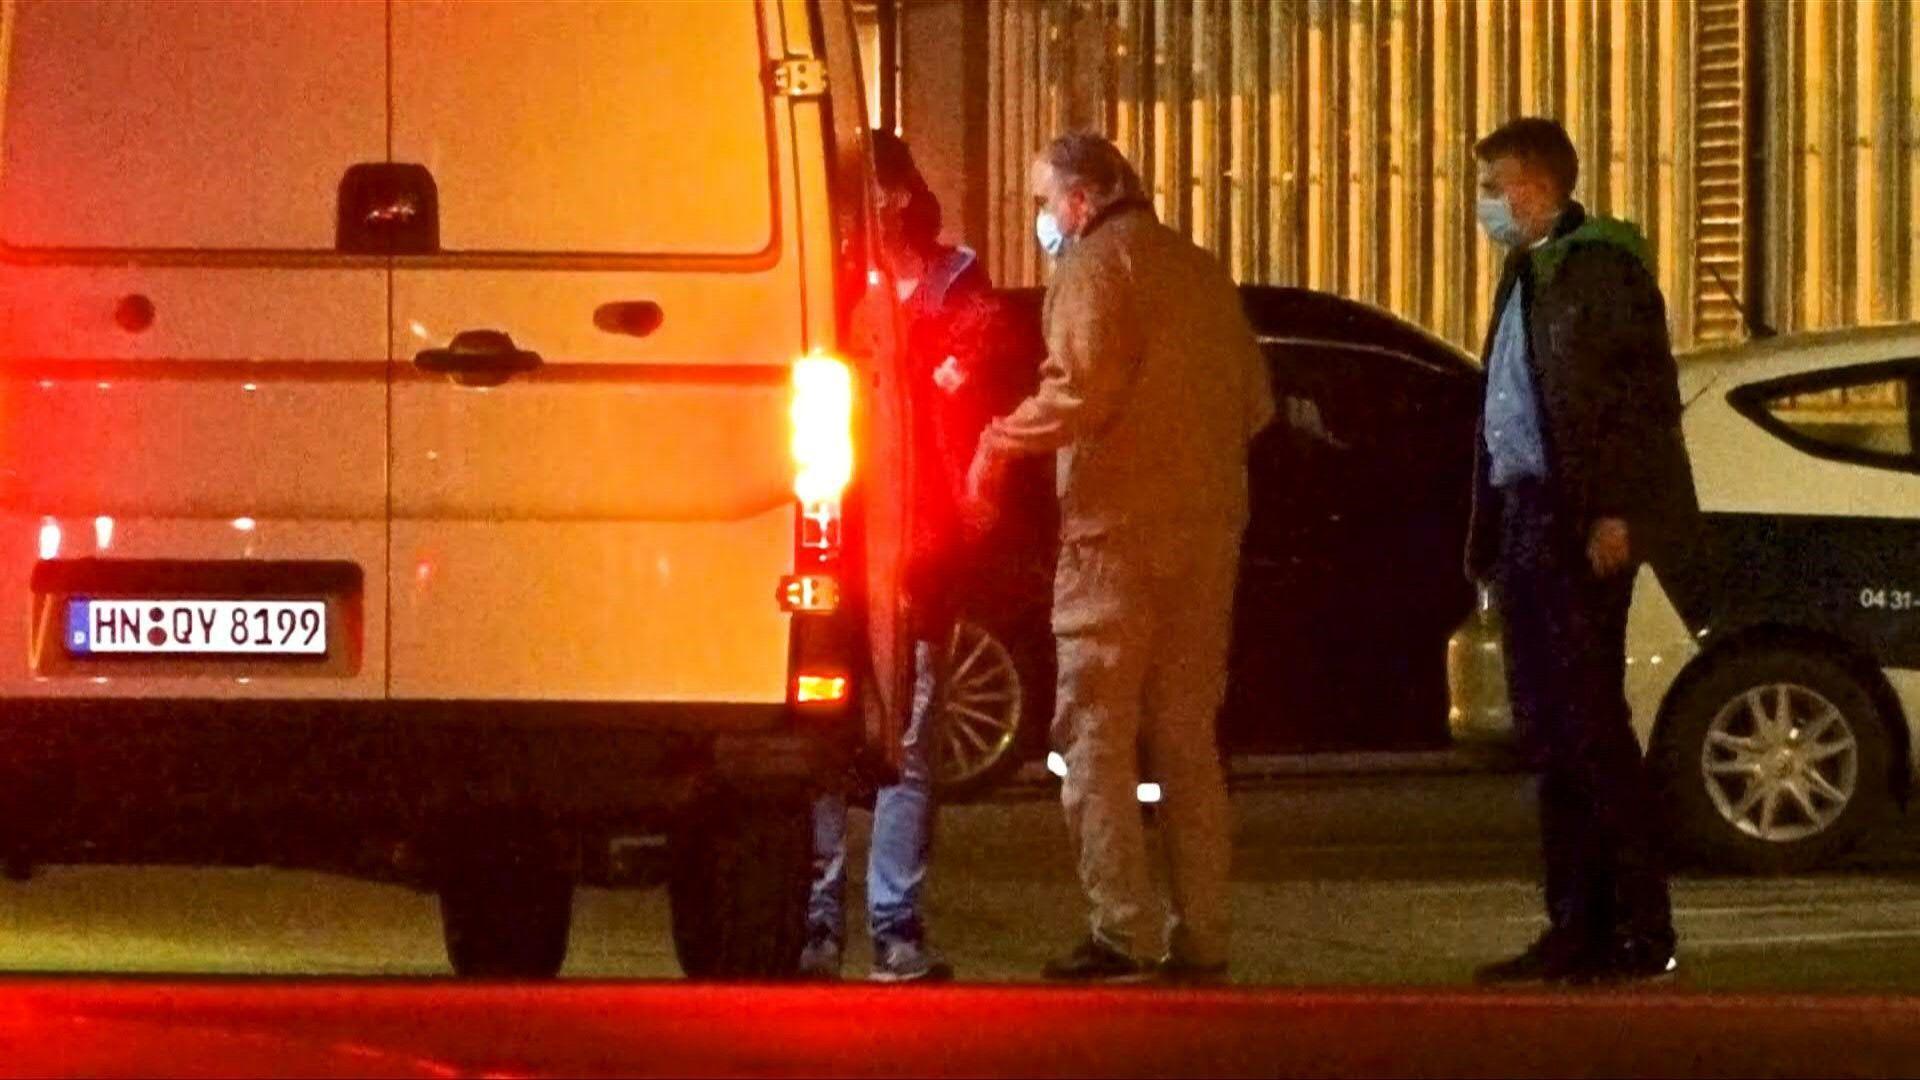 Briefbombe explodiert in Lidl-Verwaltung